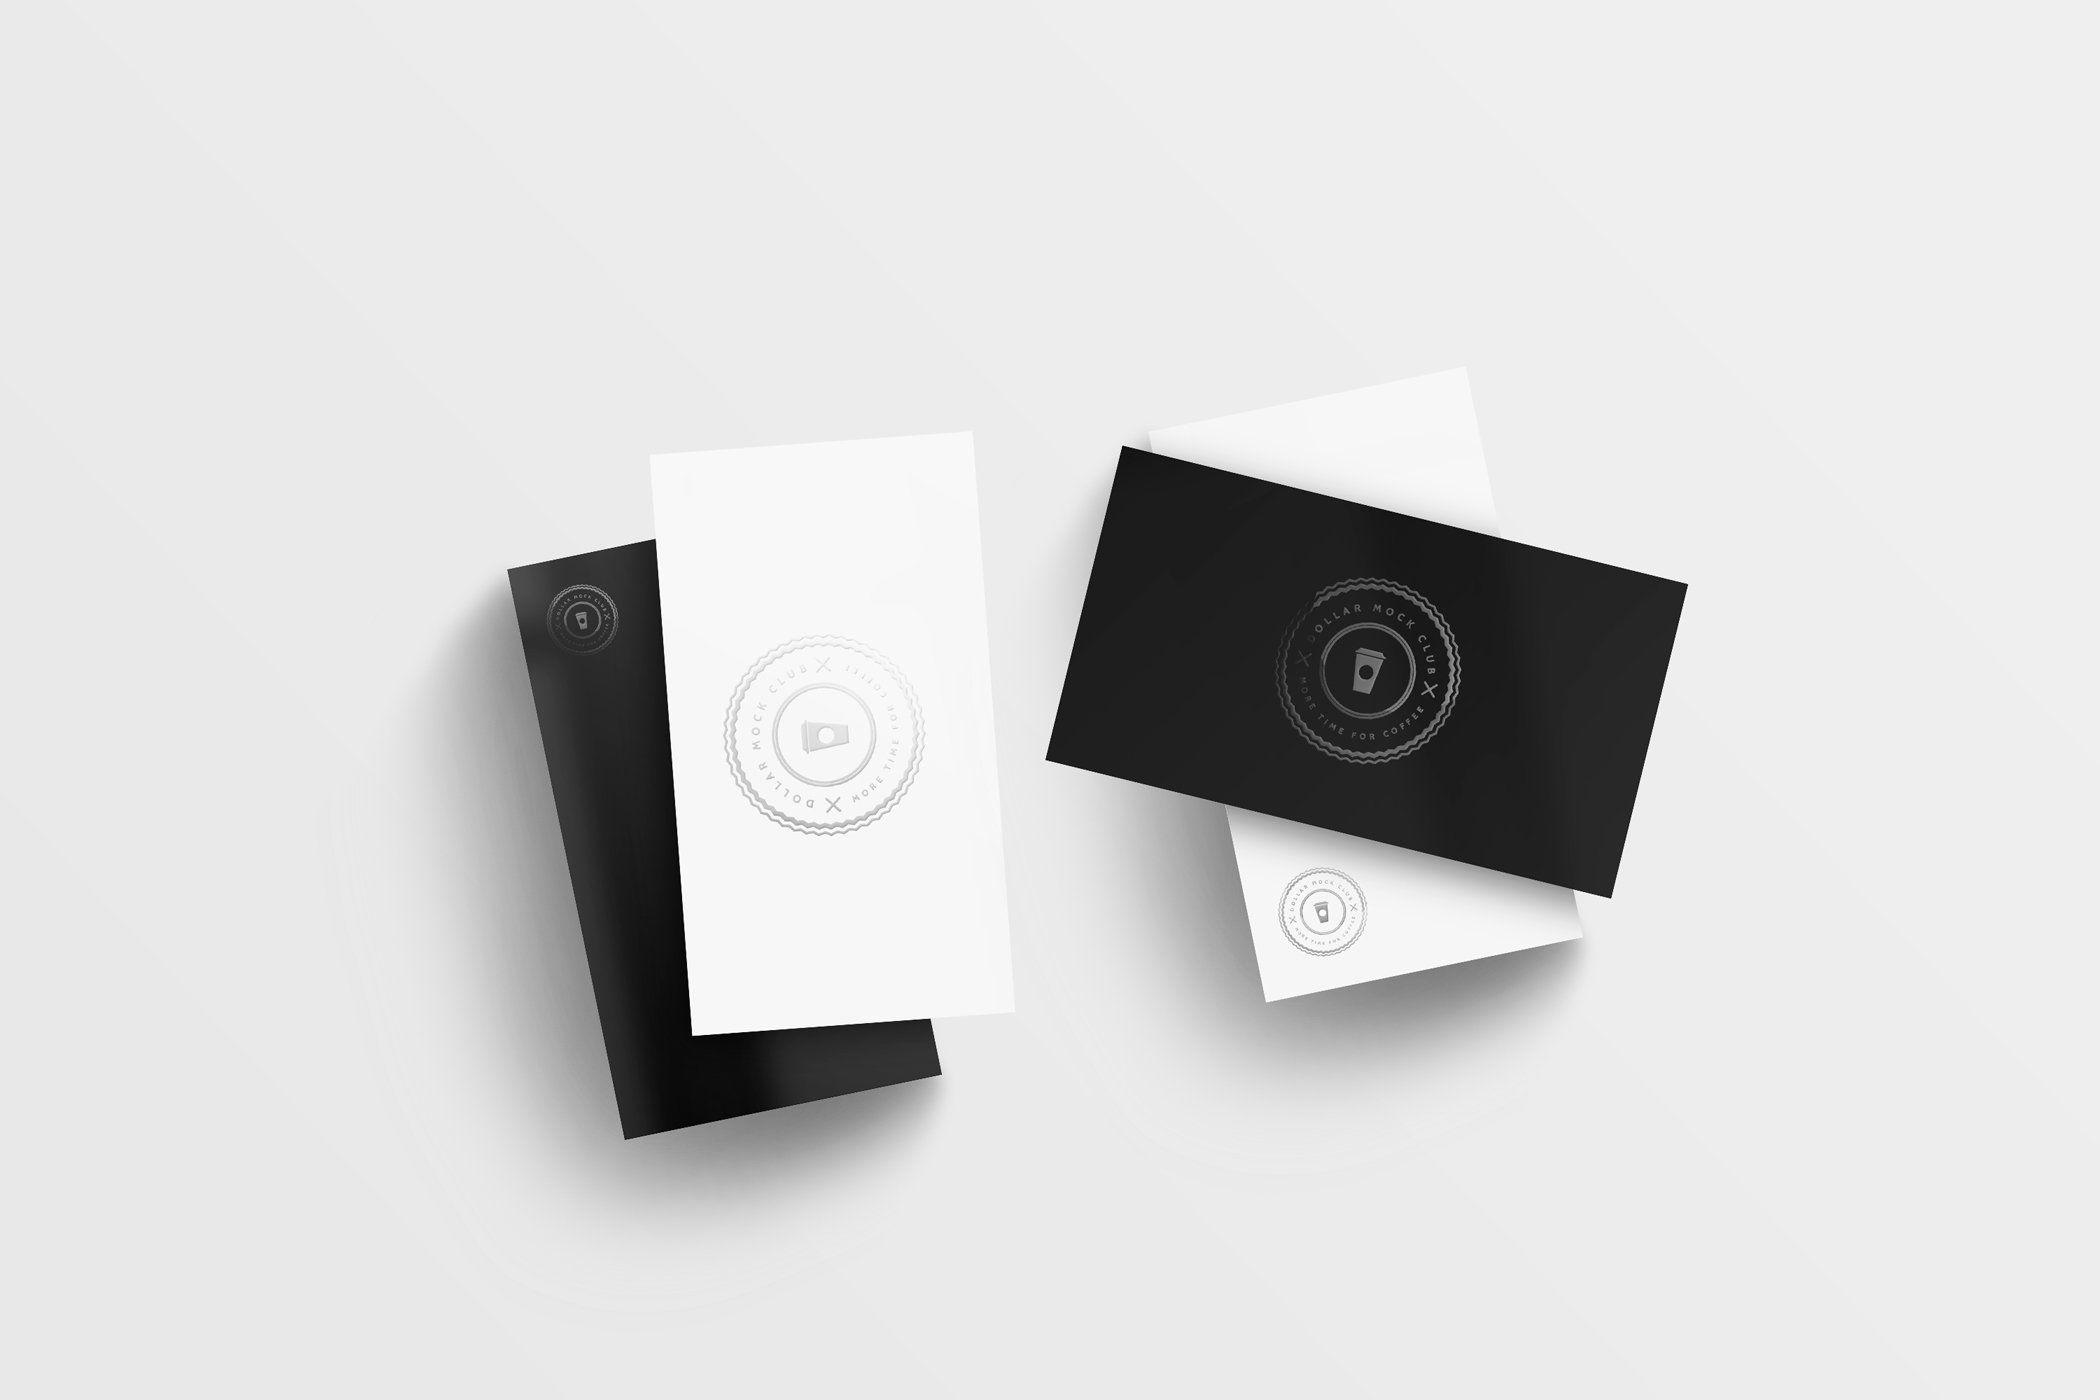 Spot Uv Business Card Mockup Brigh Spot Uv Business Cards Business Card Mock Up Spot Uv